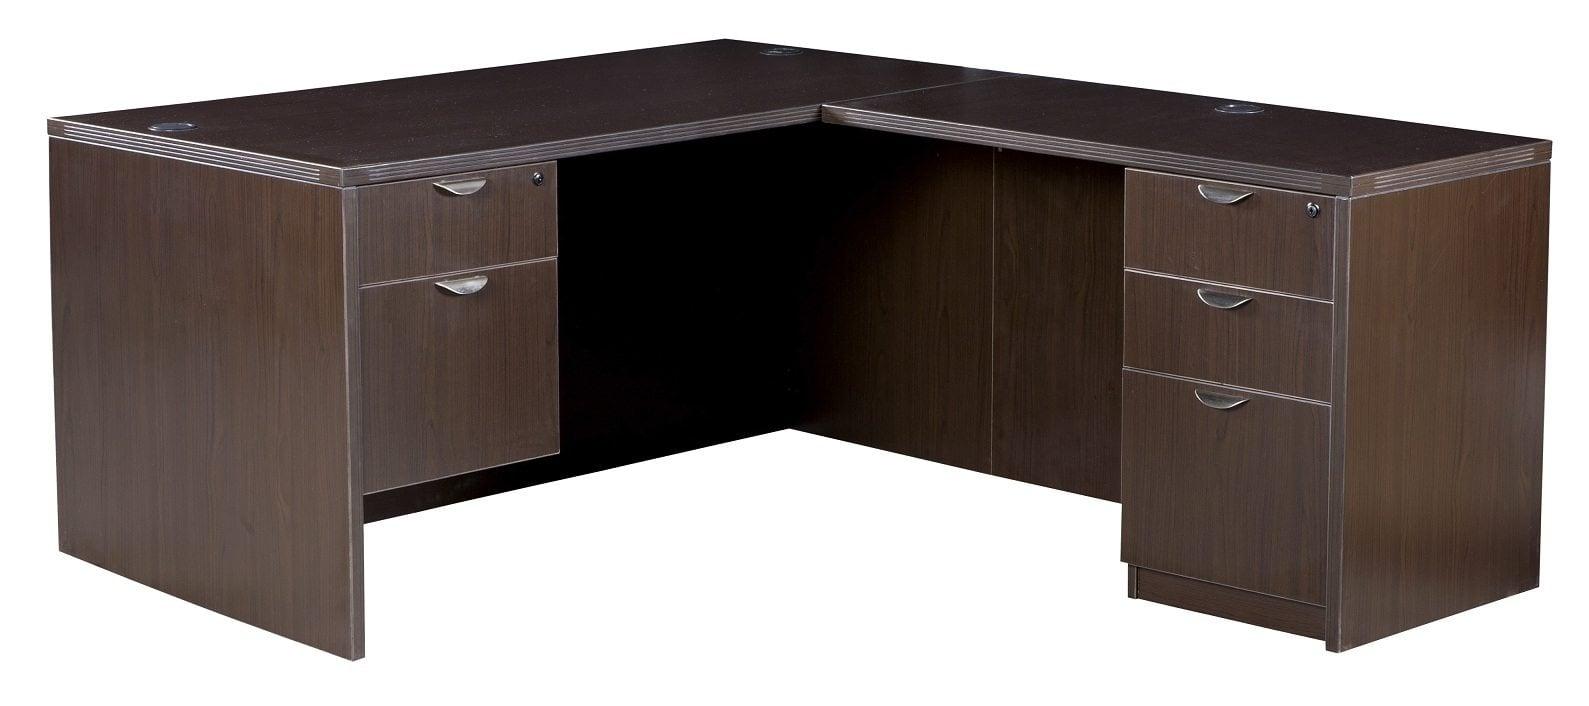 0901 New Espresso Laminate 30 215 60 L Shape Desk National